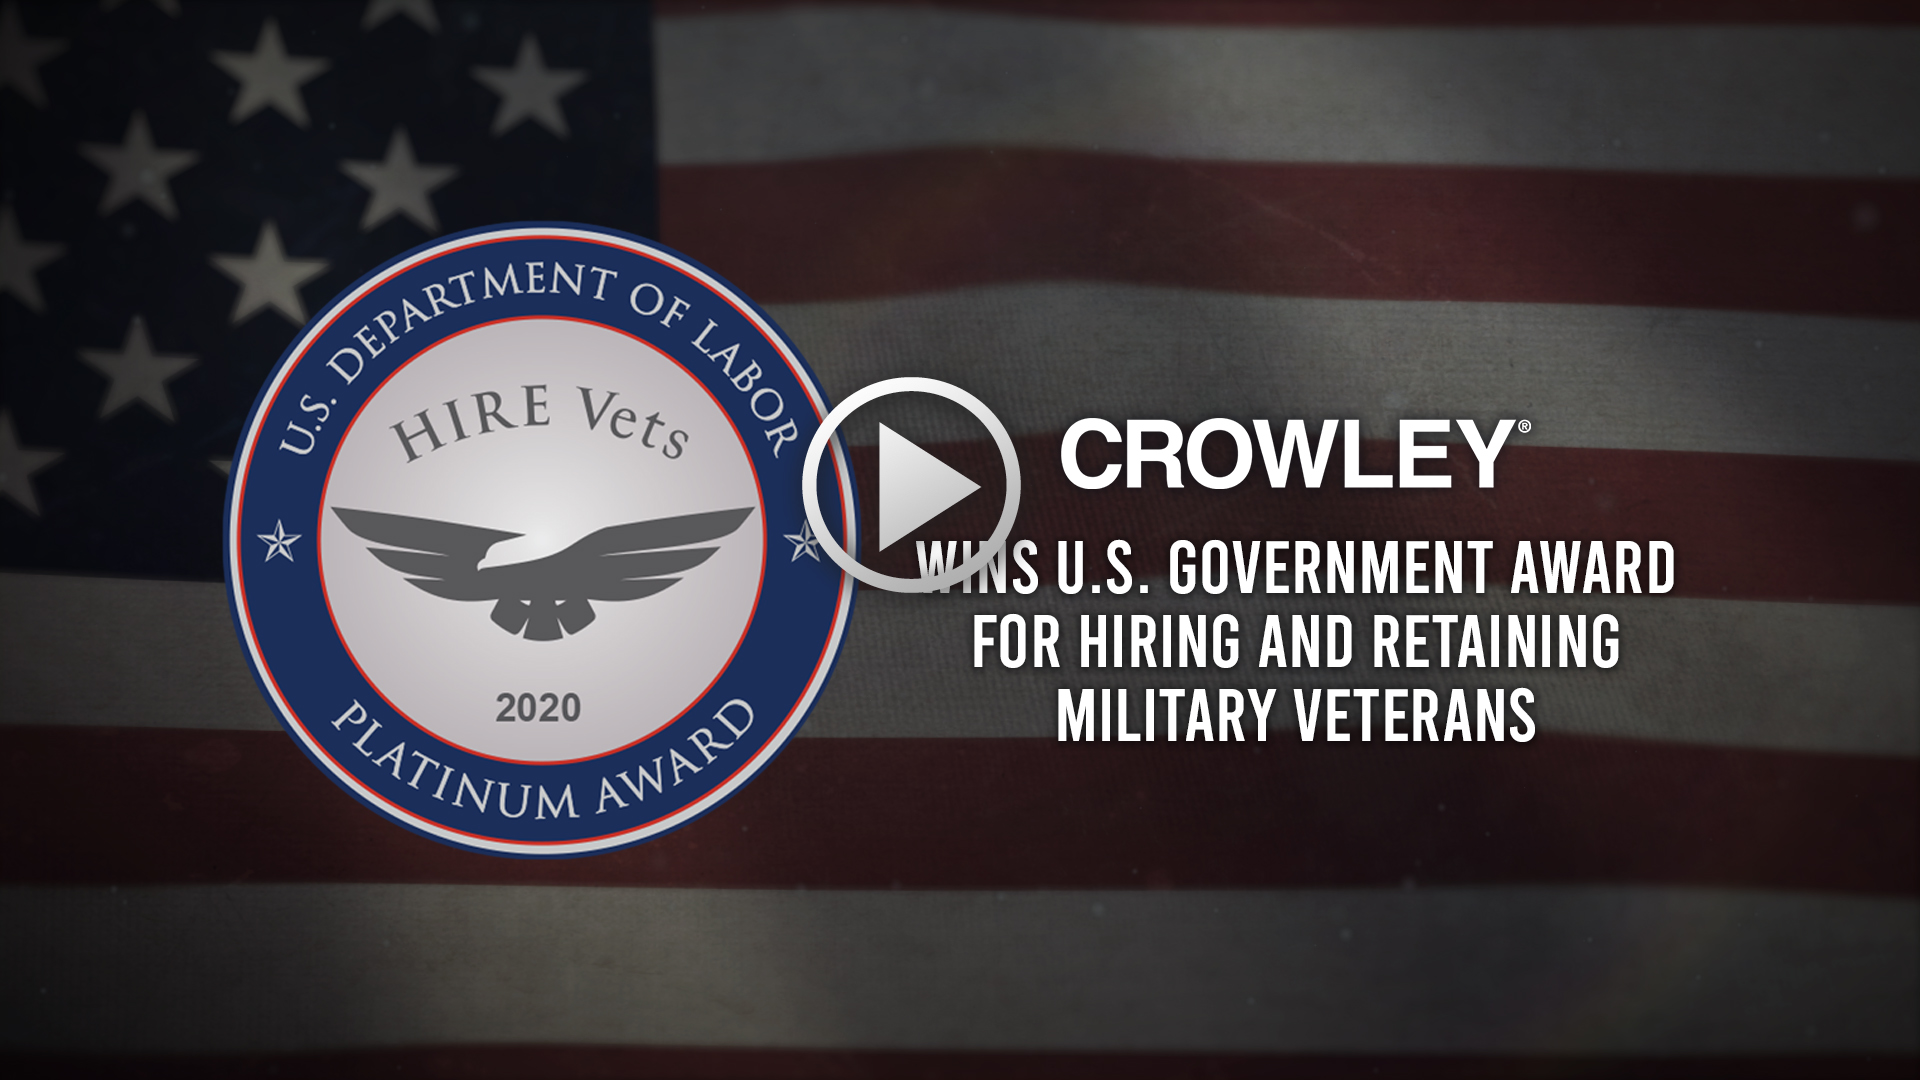 Crowley-Medallion-Nov-2020-pr.jpg